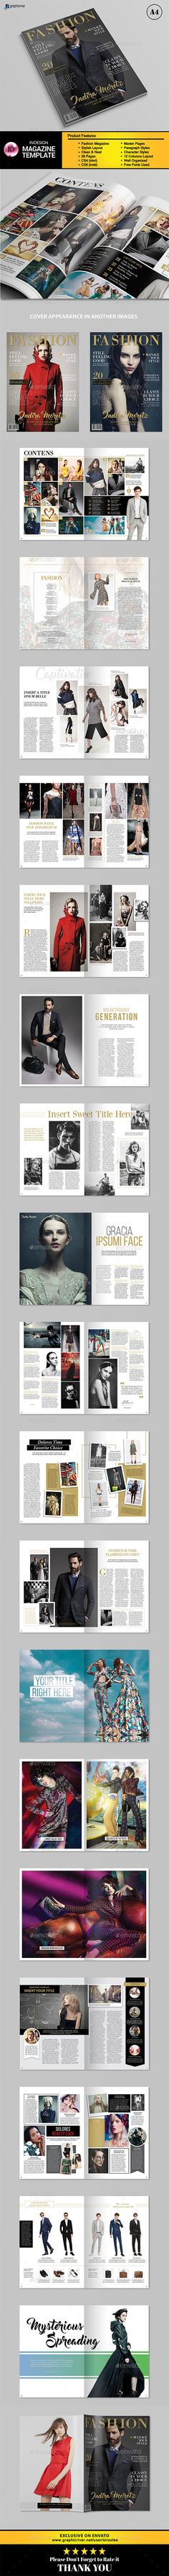 New Fashion Magazine Template InDesign INDD. Download here: http://graphicriver.net/item/new-fashion-magazine/16722703?ref=ksioks